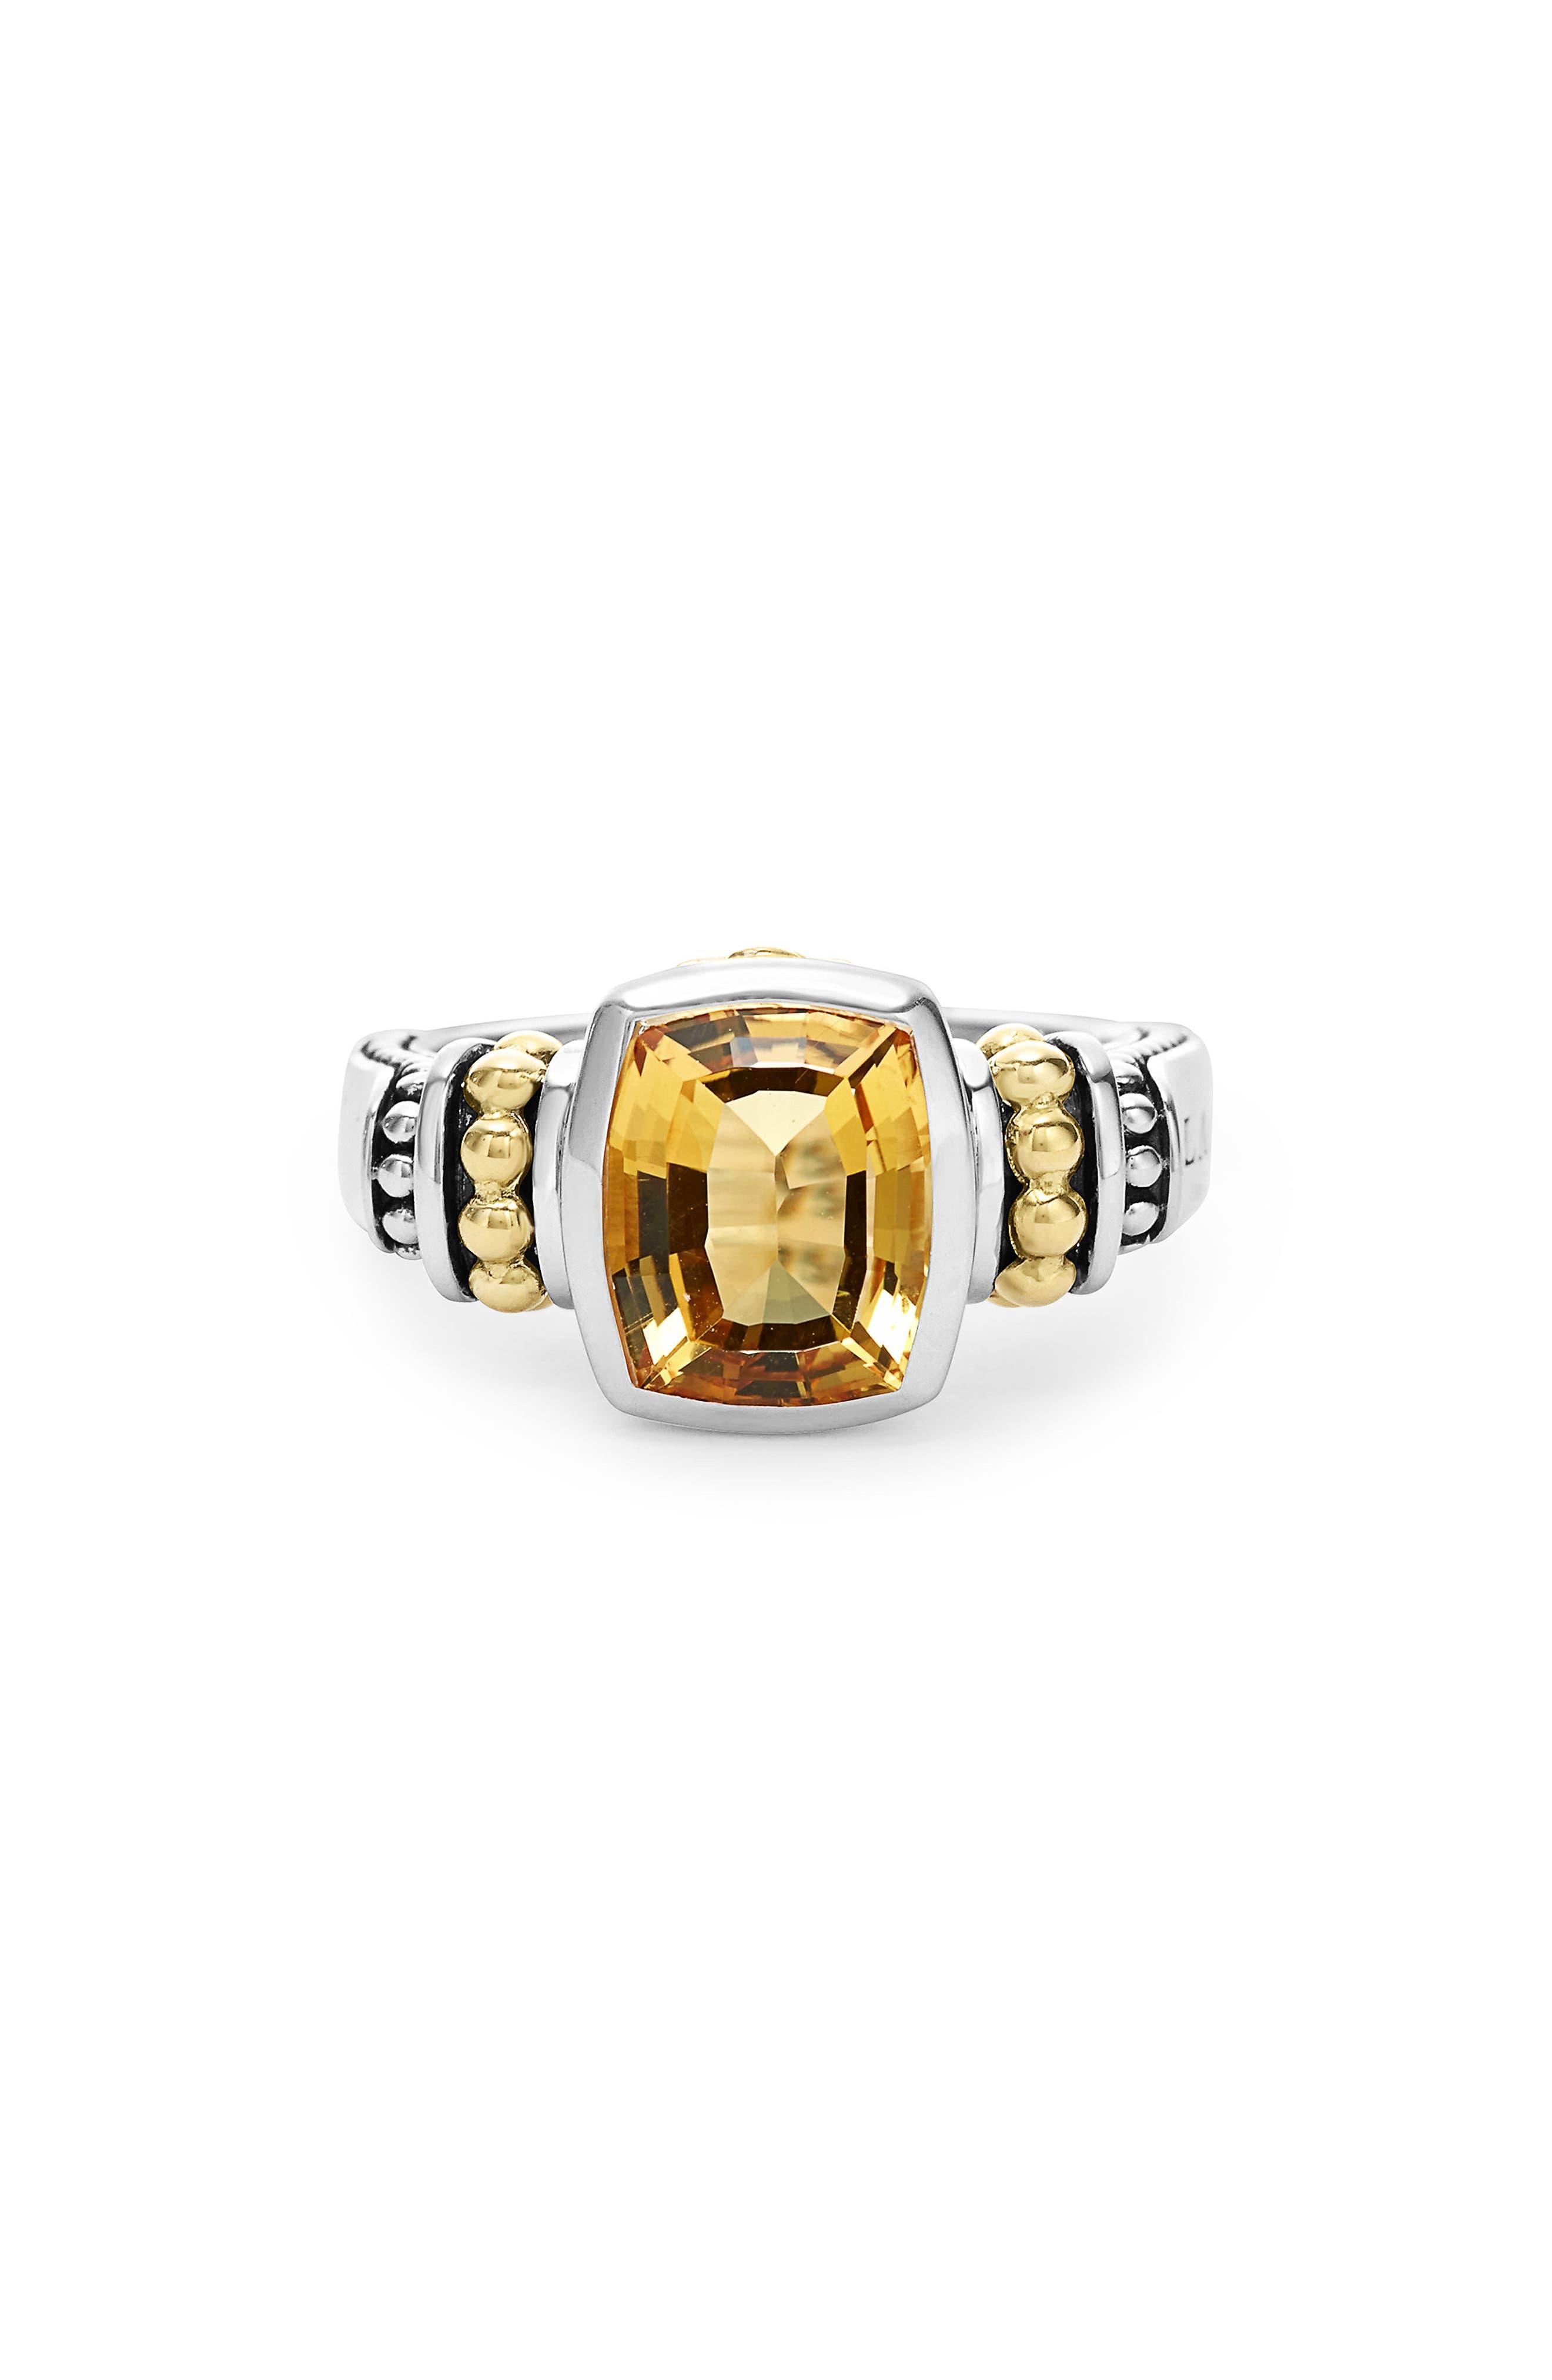 Main Image - LAGOS 'Caviar Color' Small Semiprecious Stone Ring